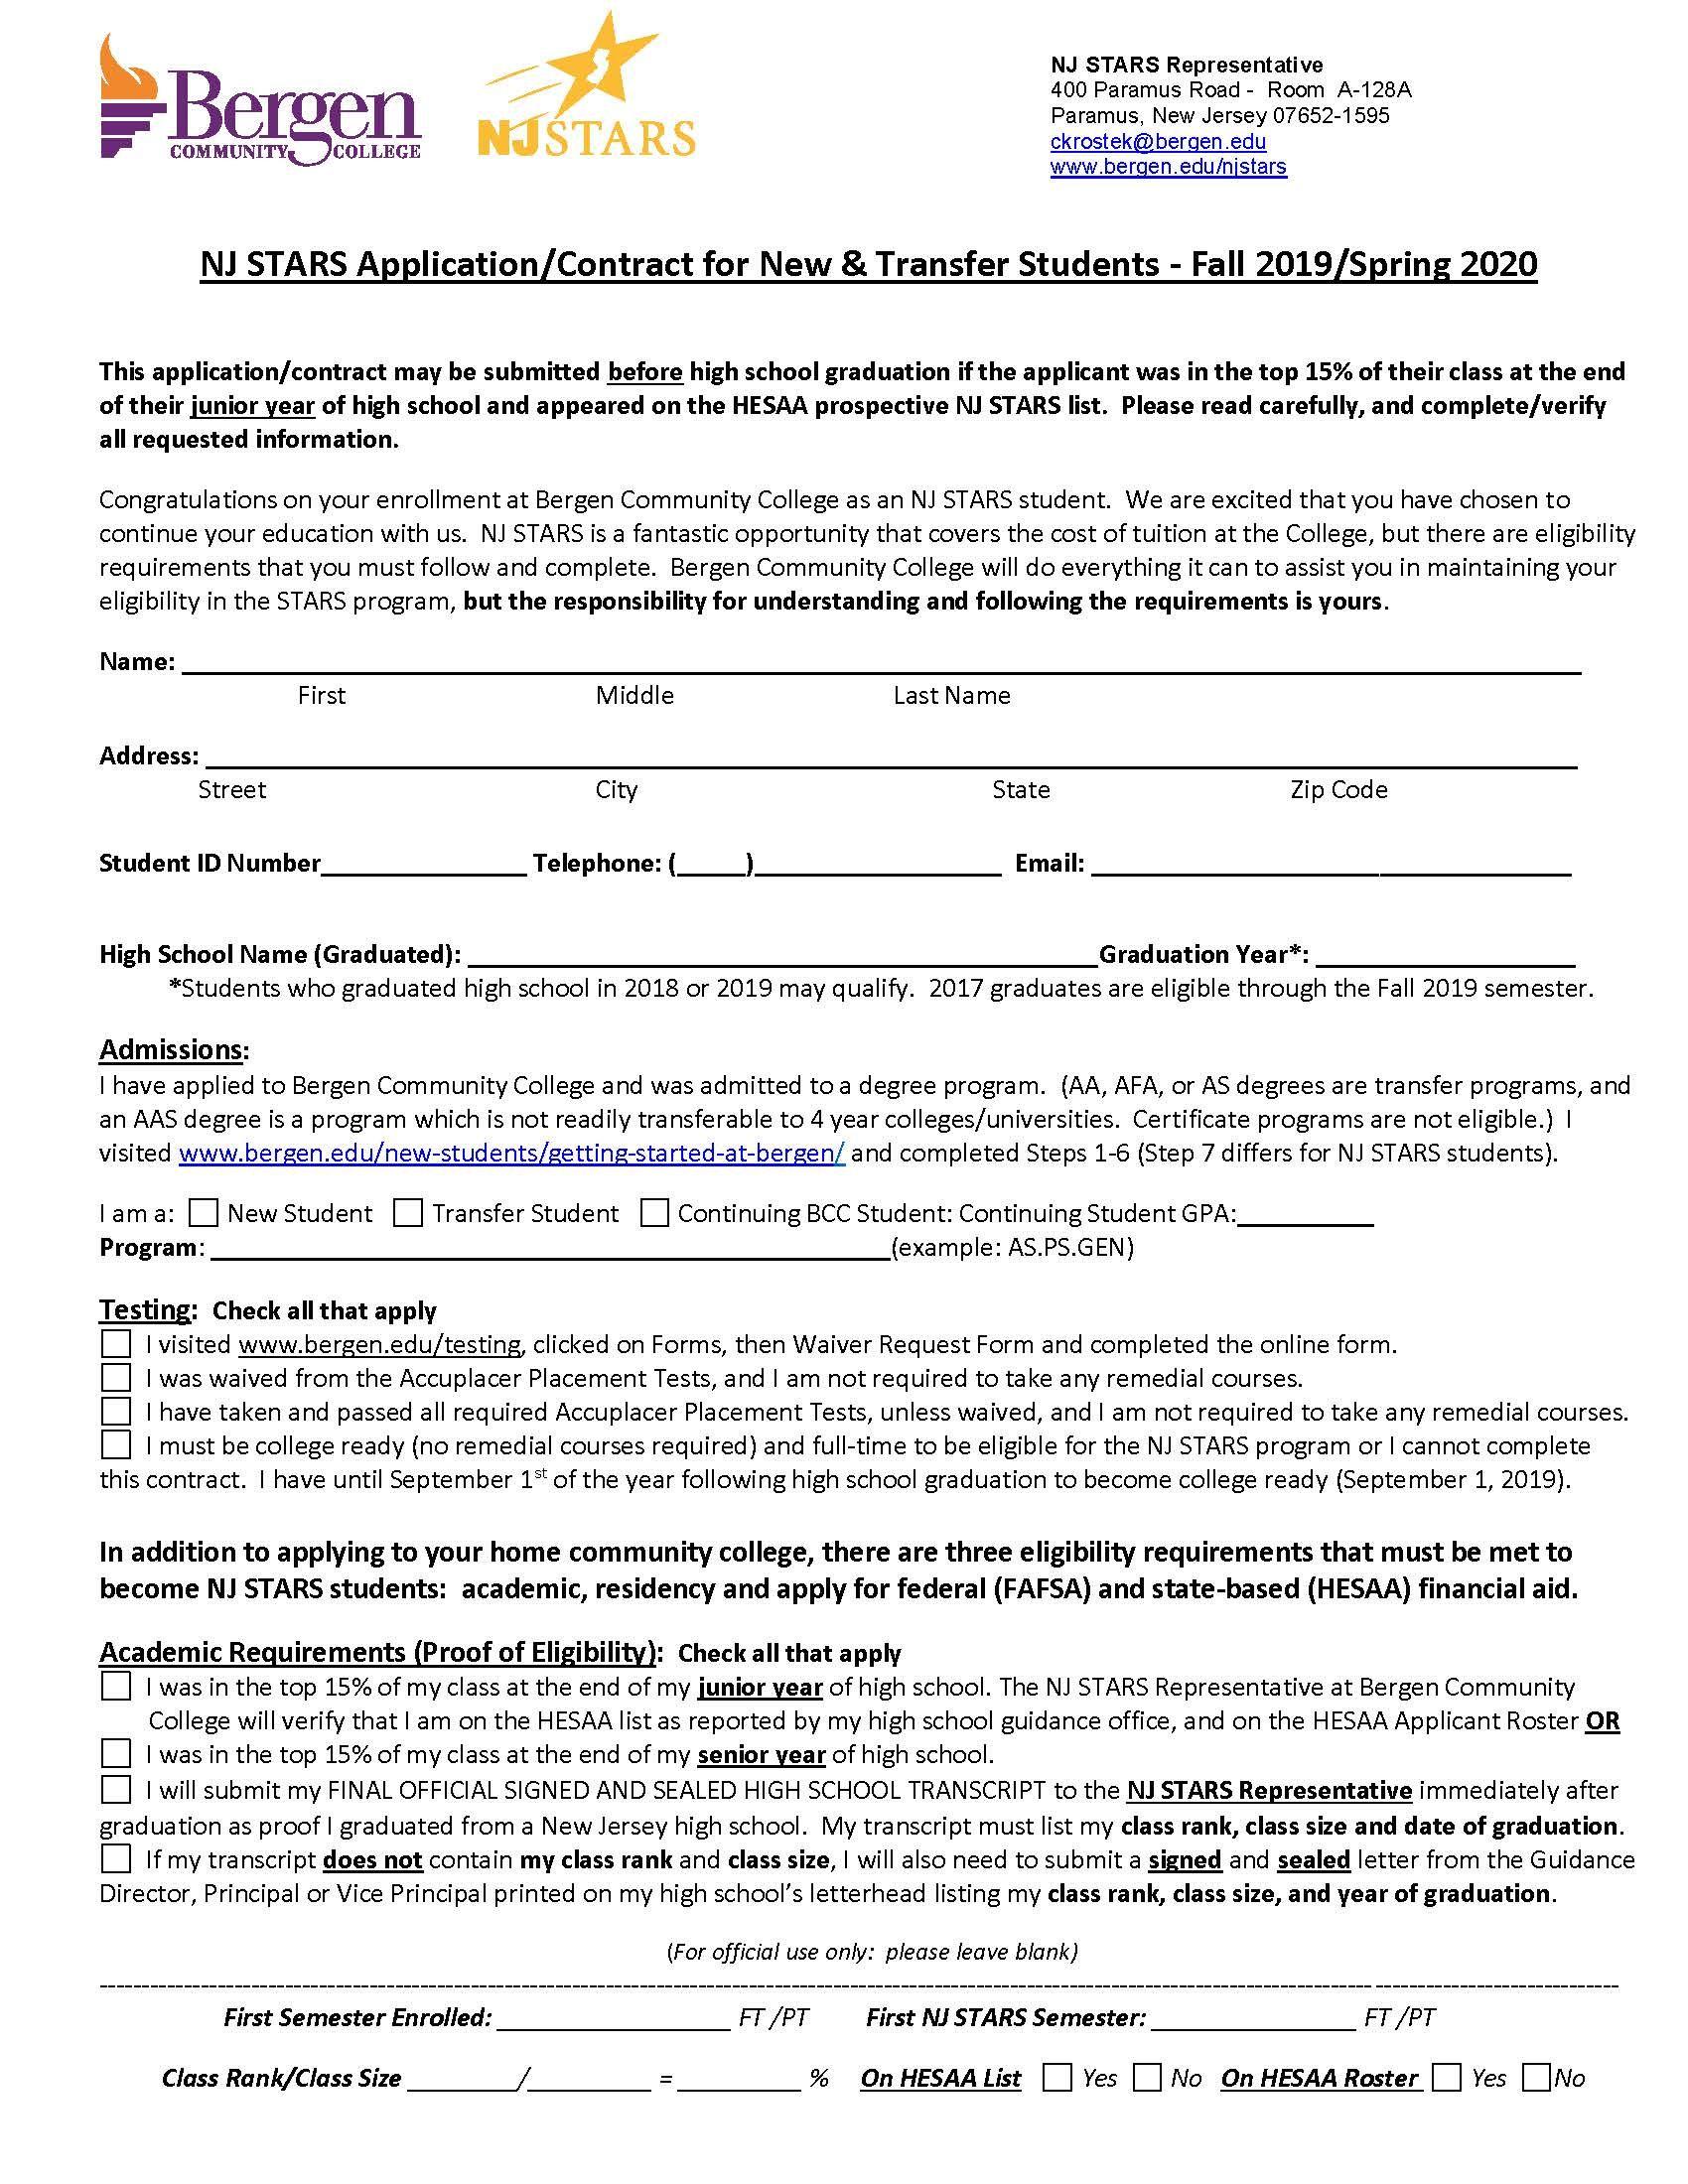 Prospective NJ STARS must fill out the NJ STARS